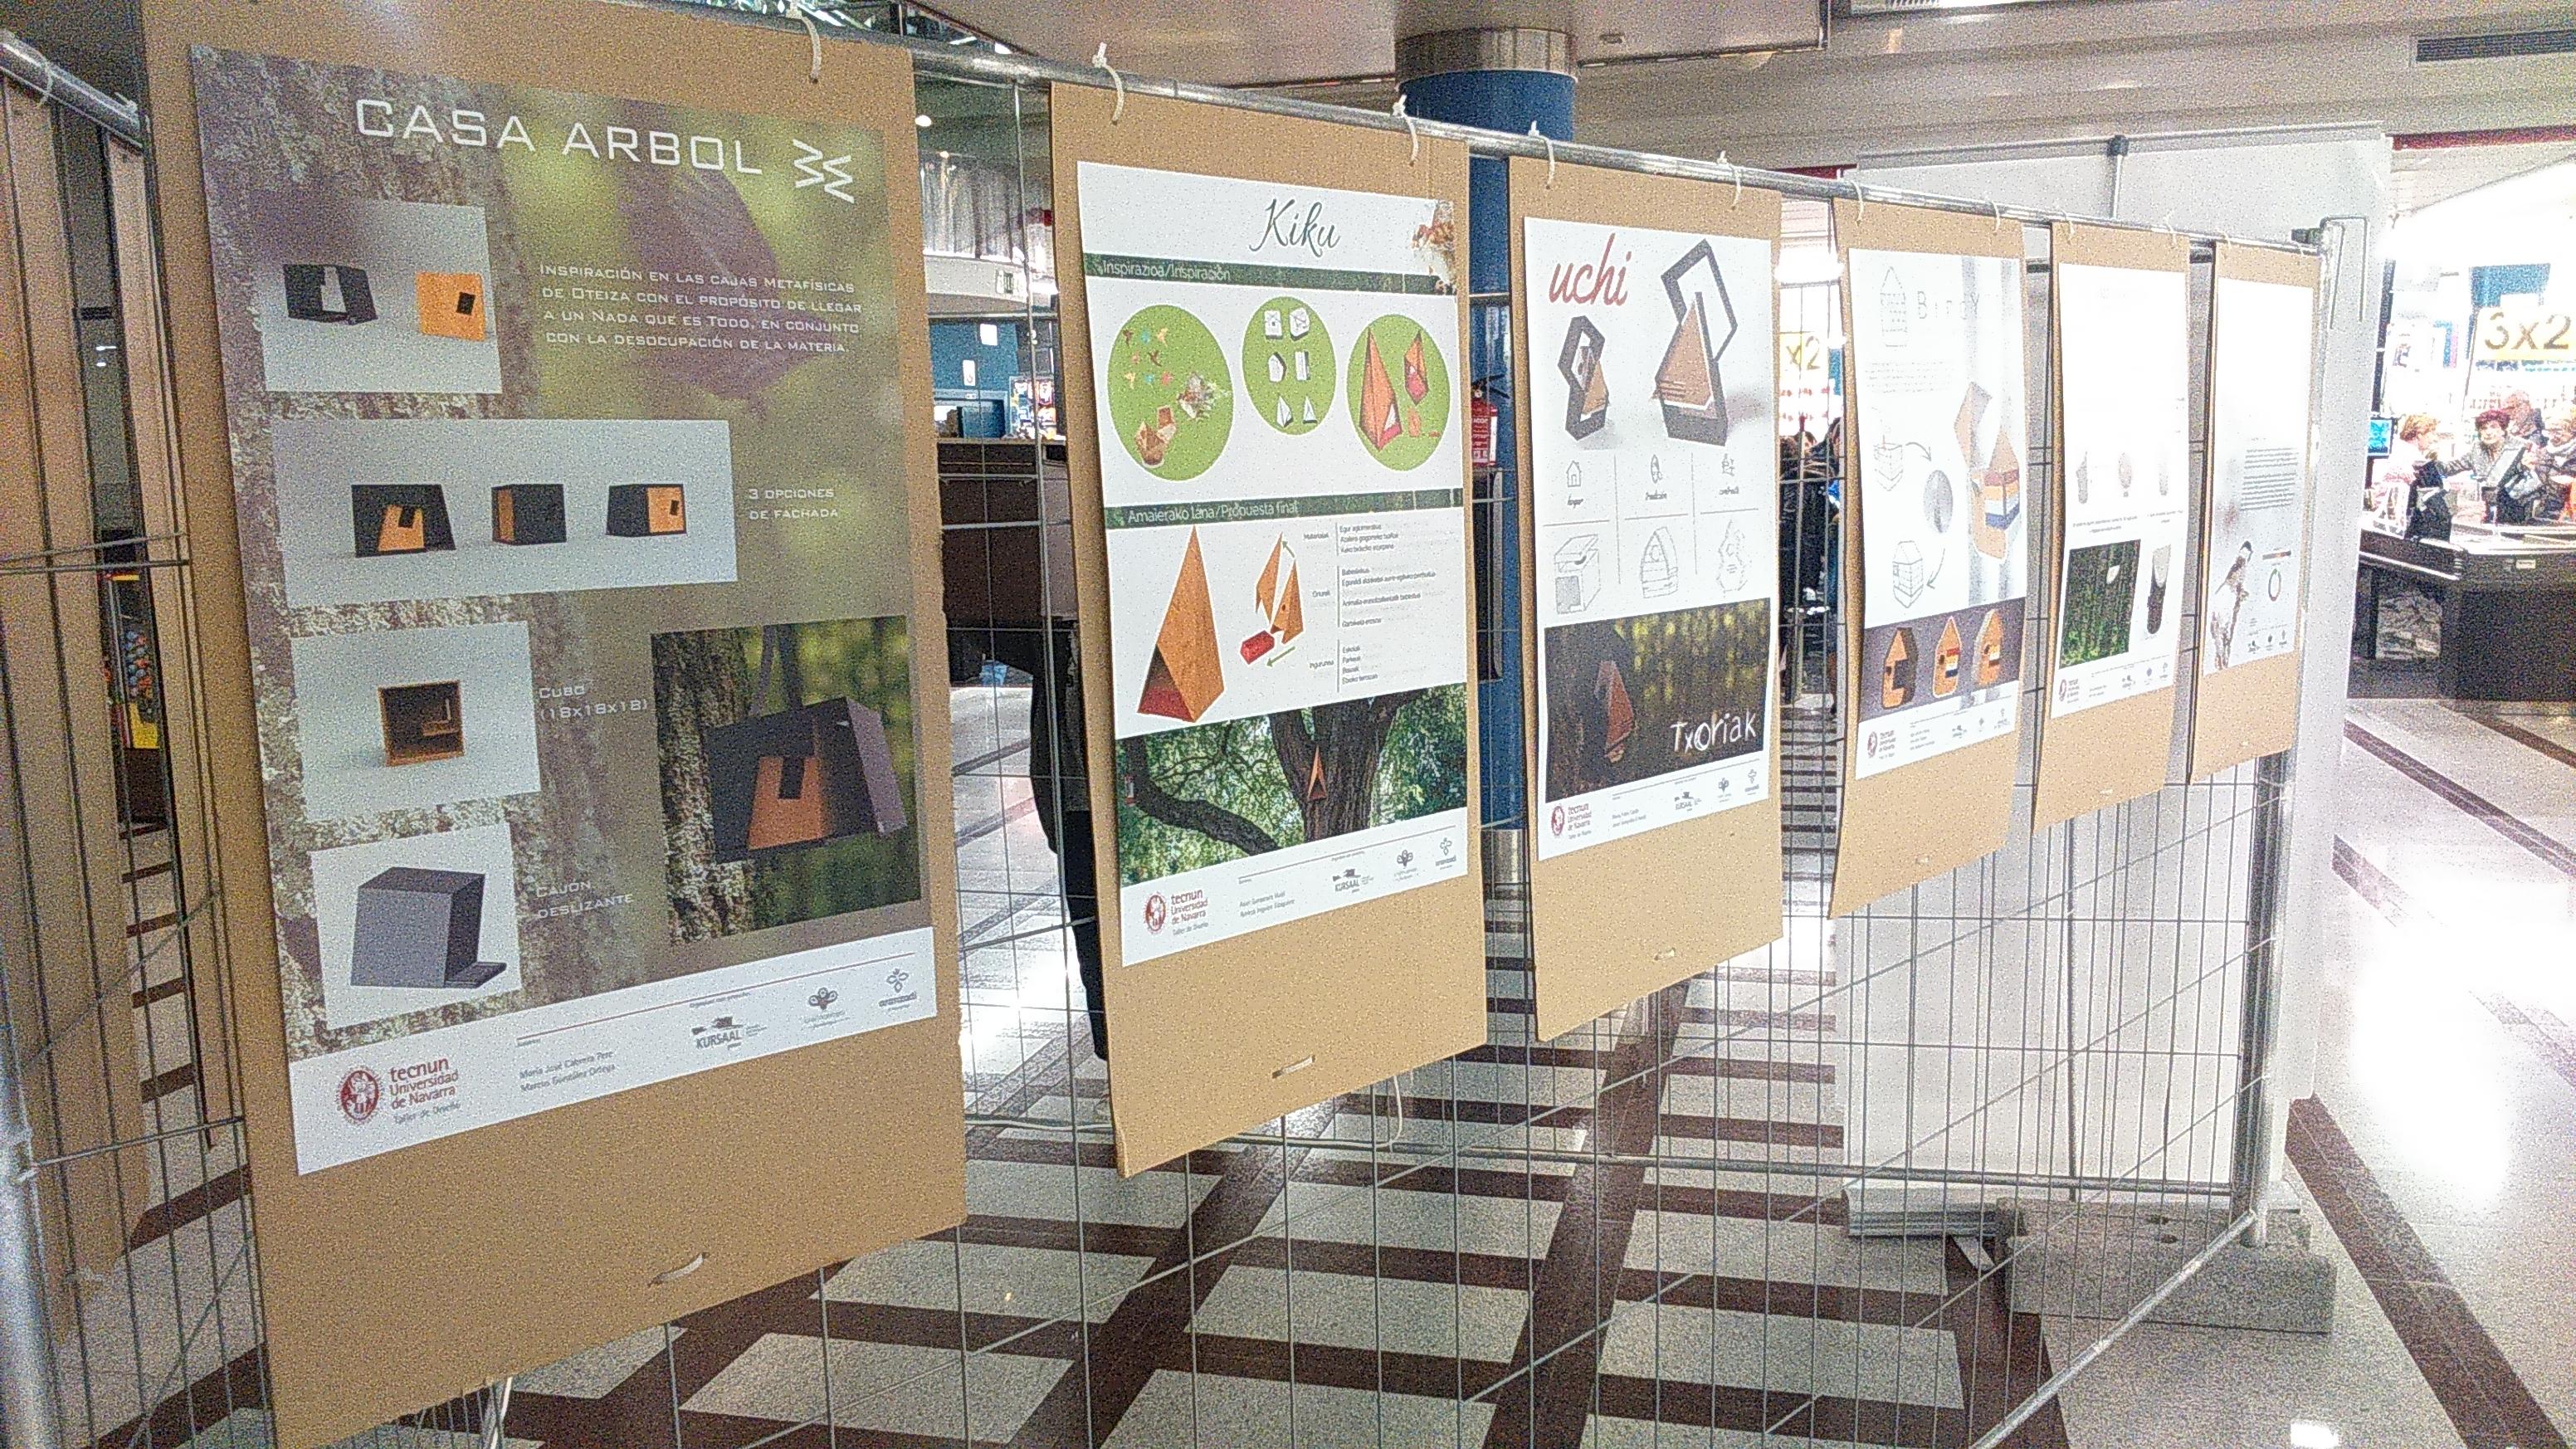 imagen 3 de noticia: kursaal-green-cristina-enea-fundazioa-y-aranzadi-inauguramos-la-exposicin-txoriak-en-arcco